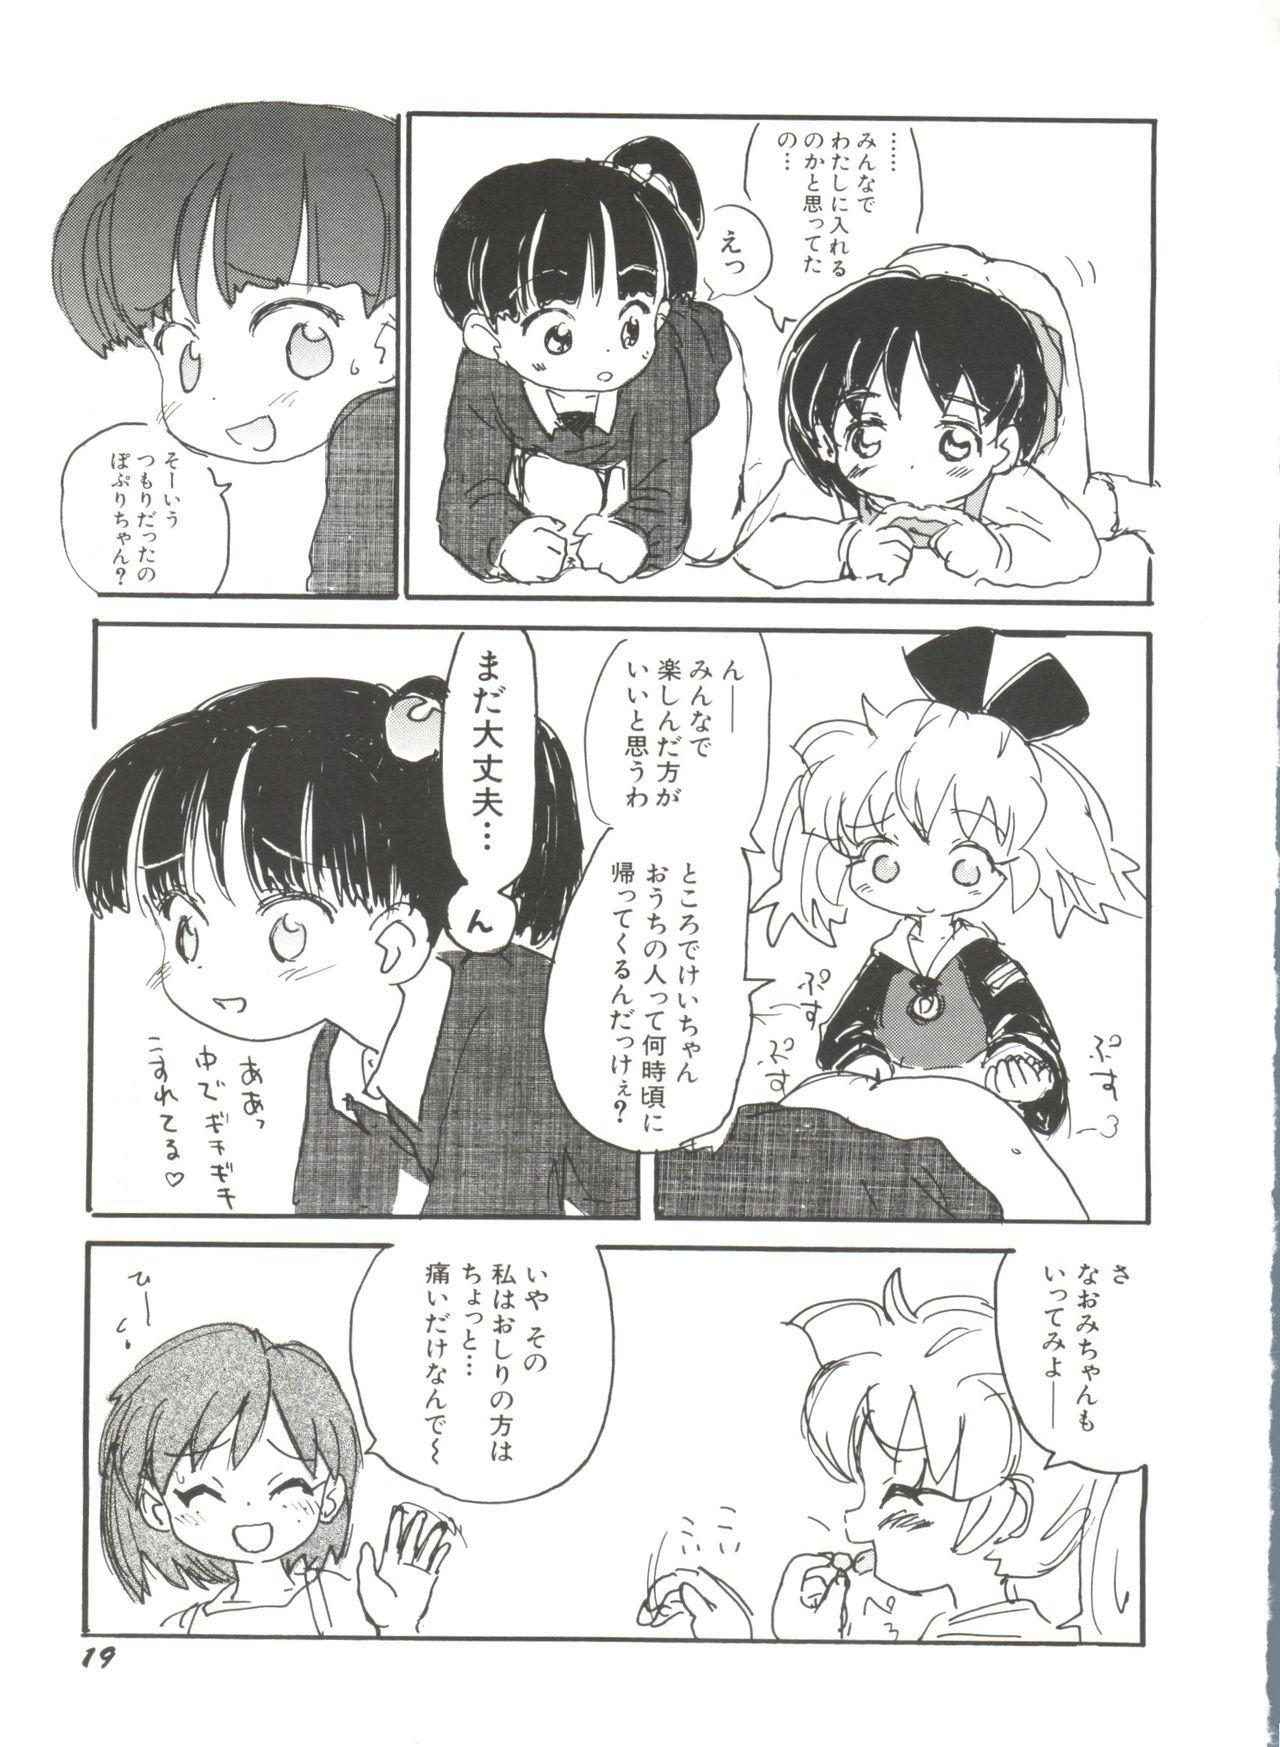 [Anthology] Denei Tamatebako 8 - Utakata no Tenshi-tachi II (Various) 20